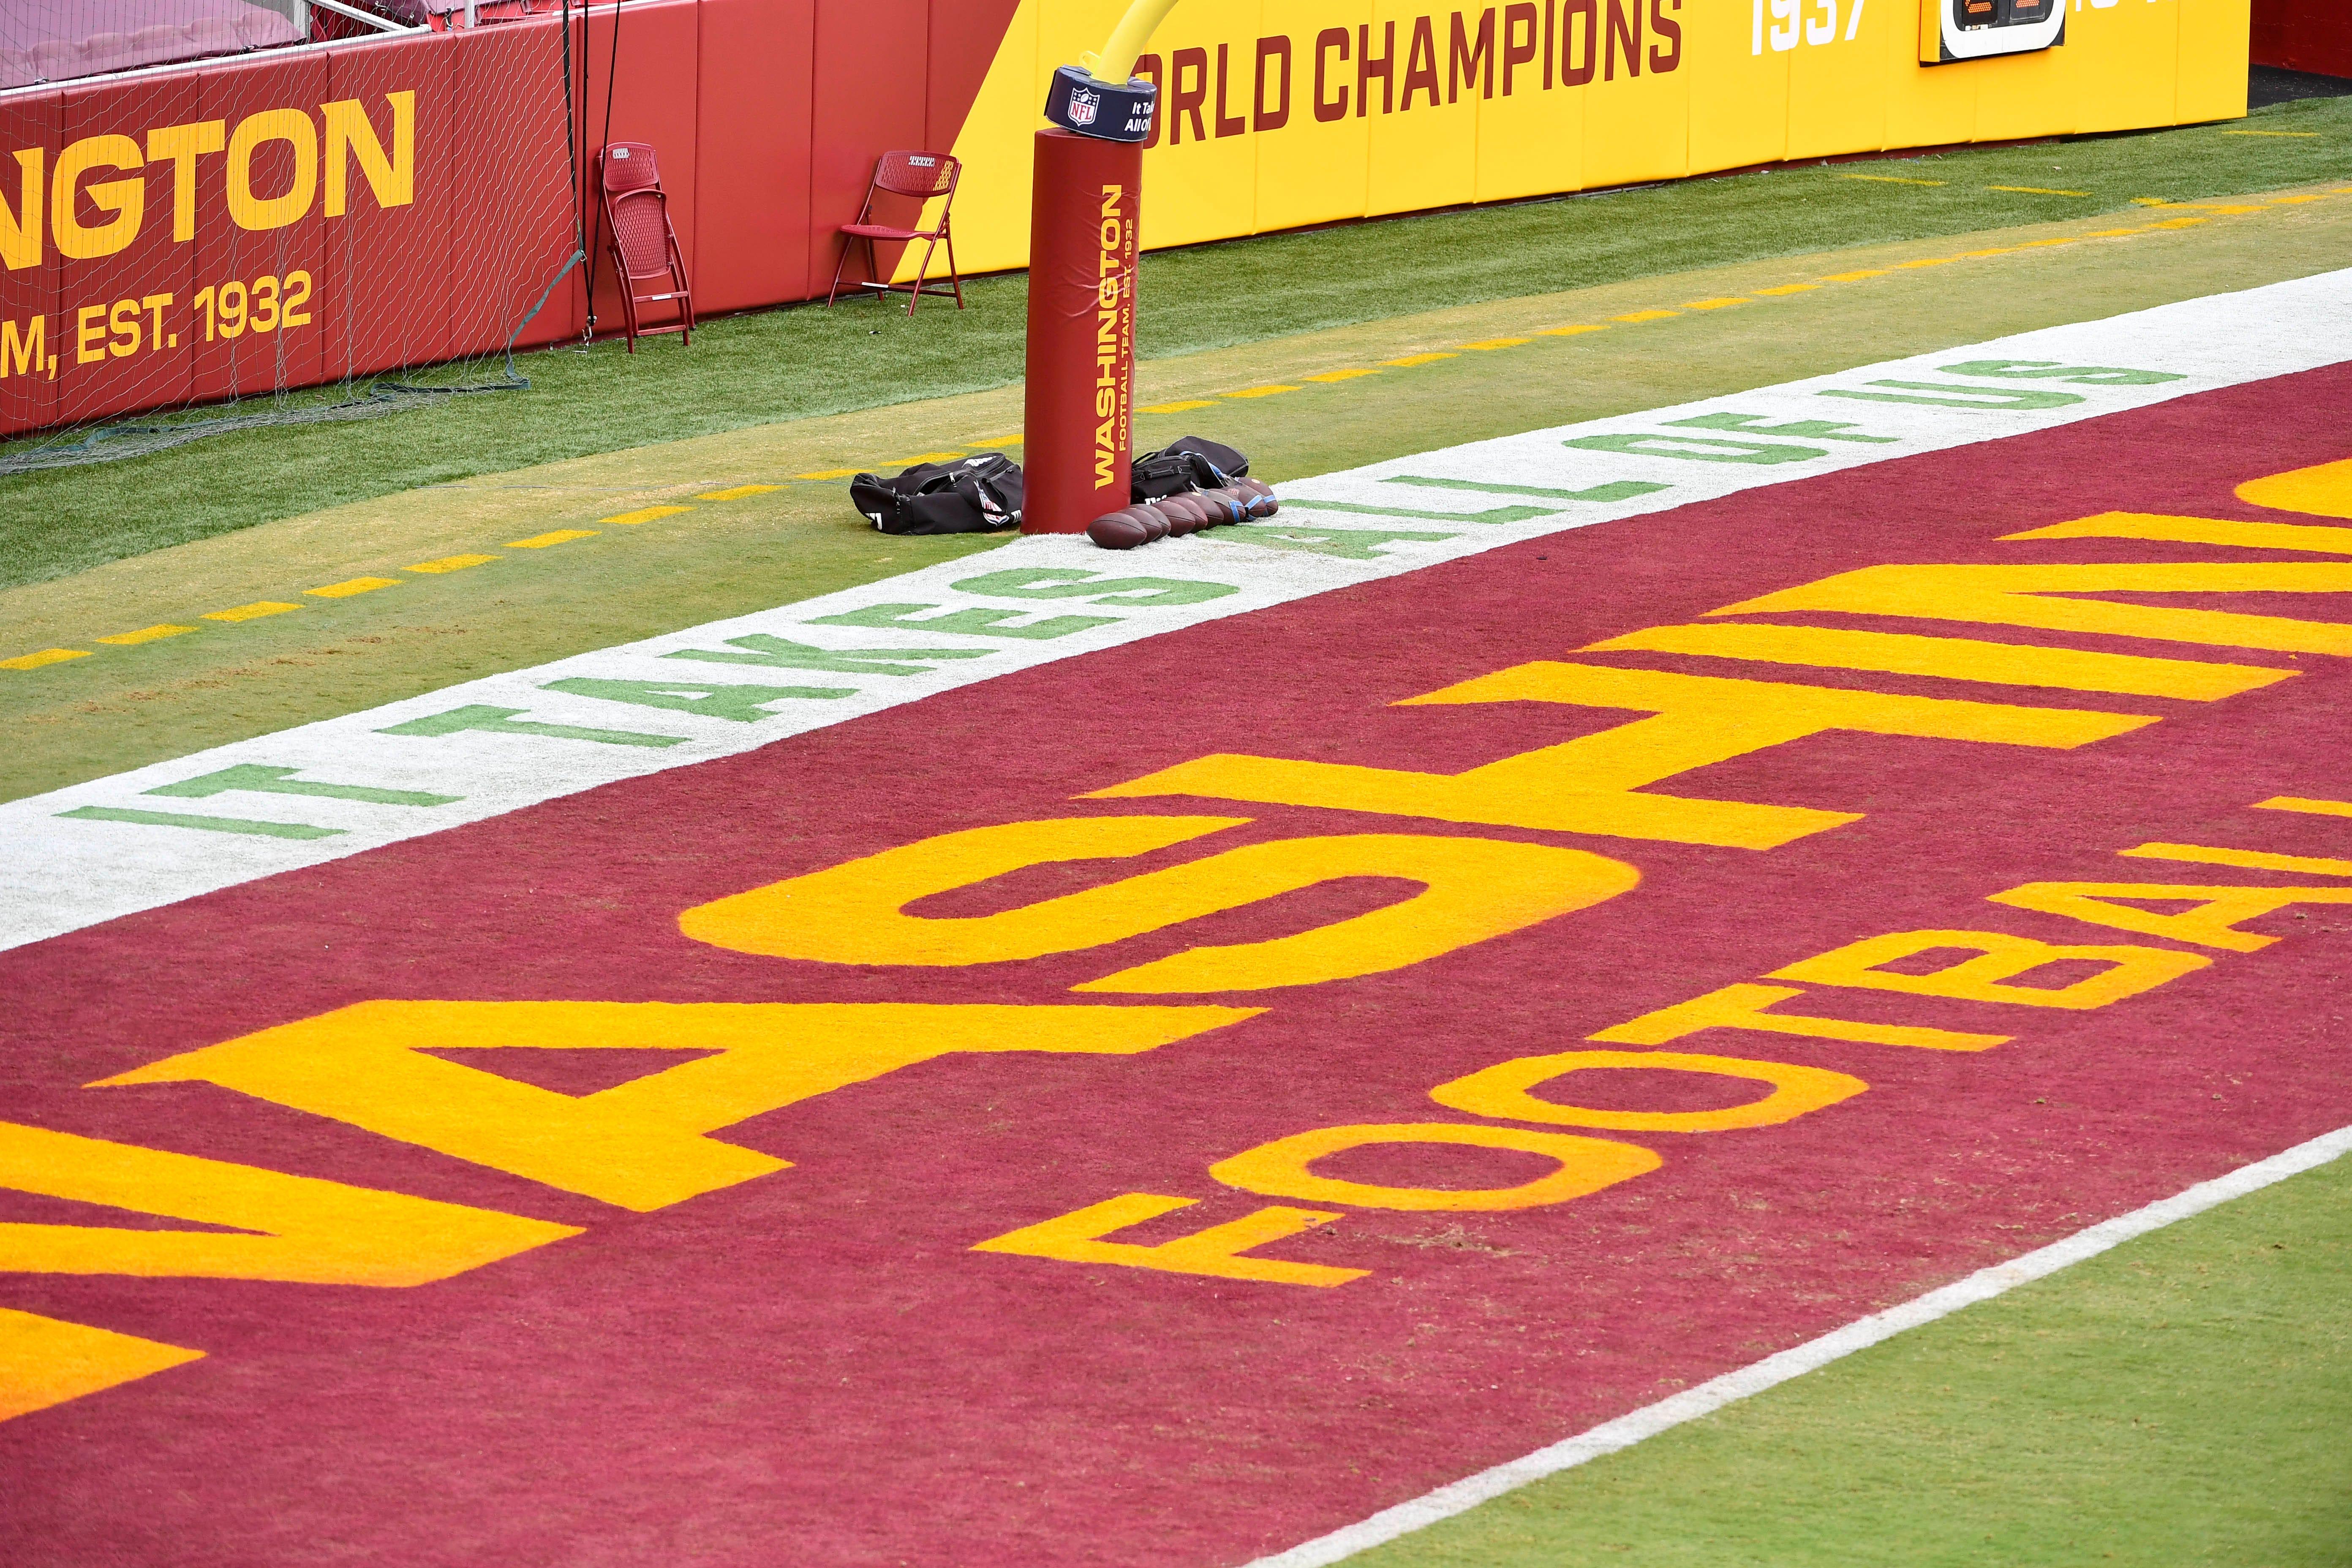 'Pretty good chance': Washington to remain Football Team through 2021, team president says